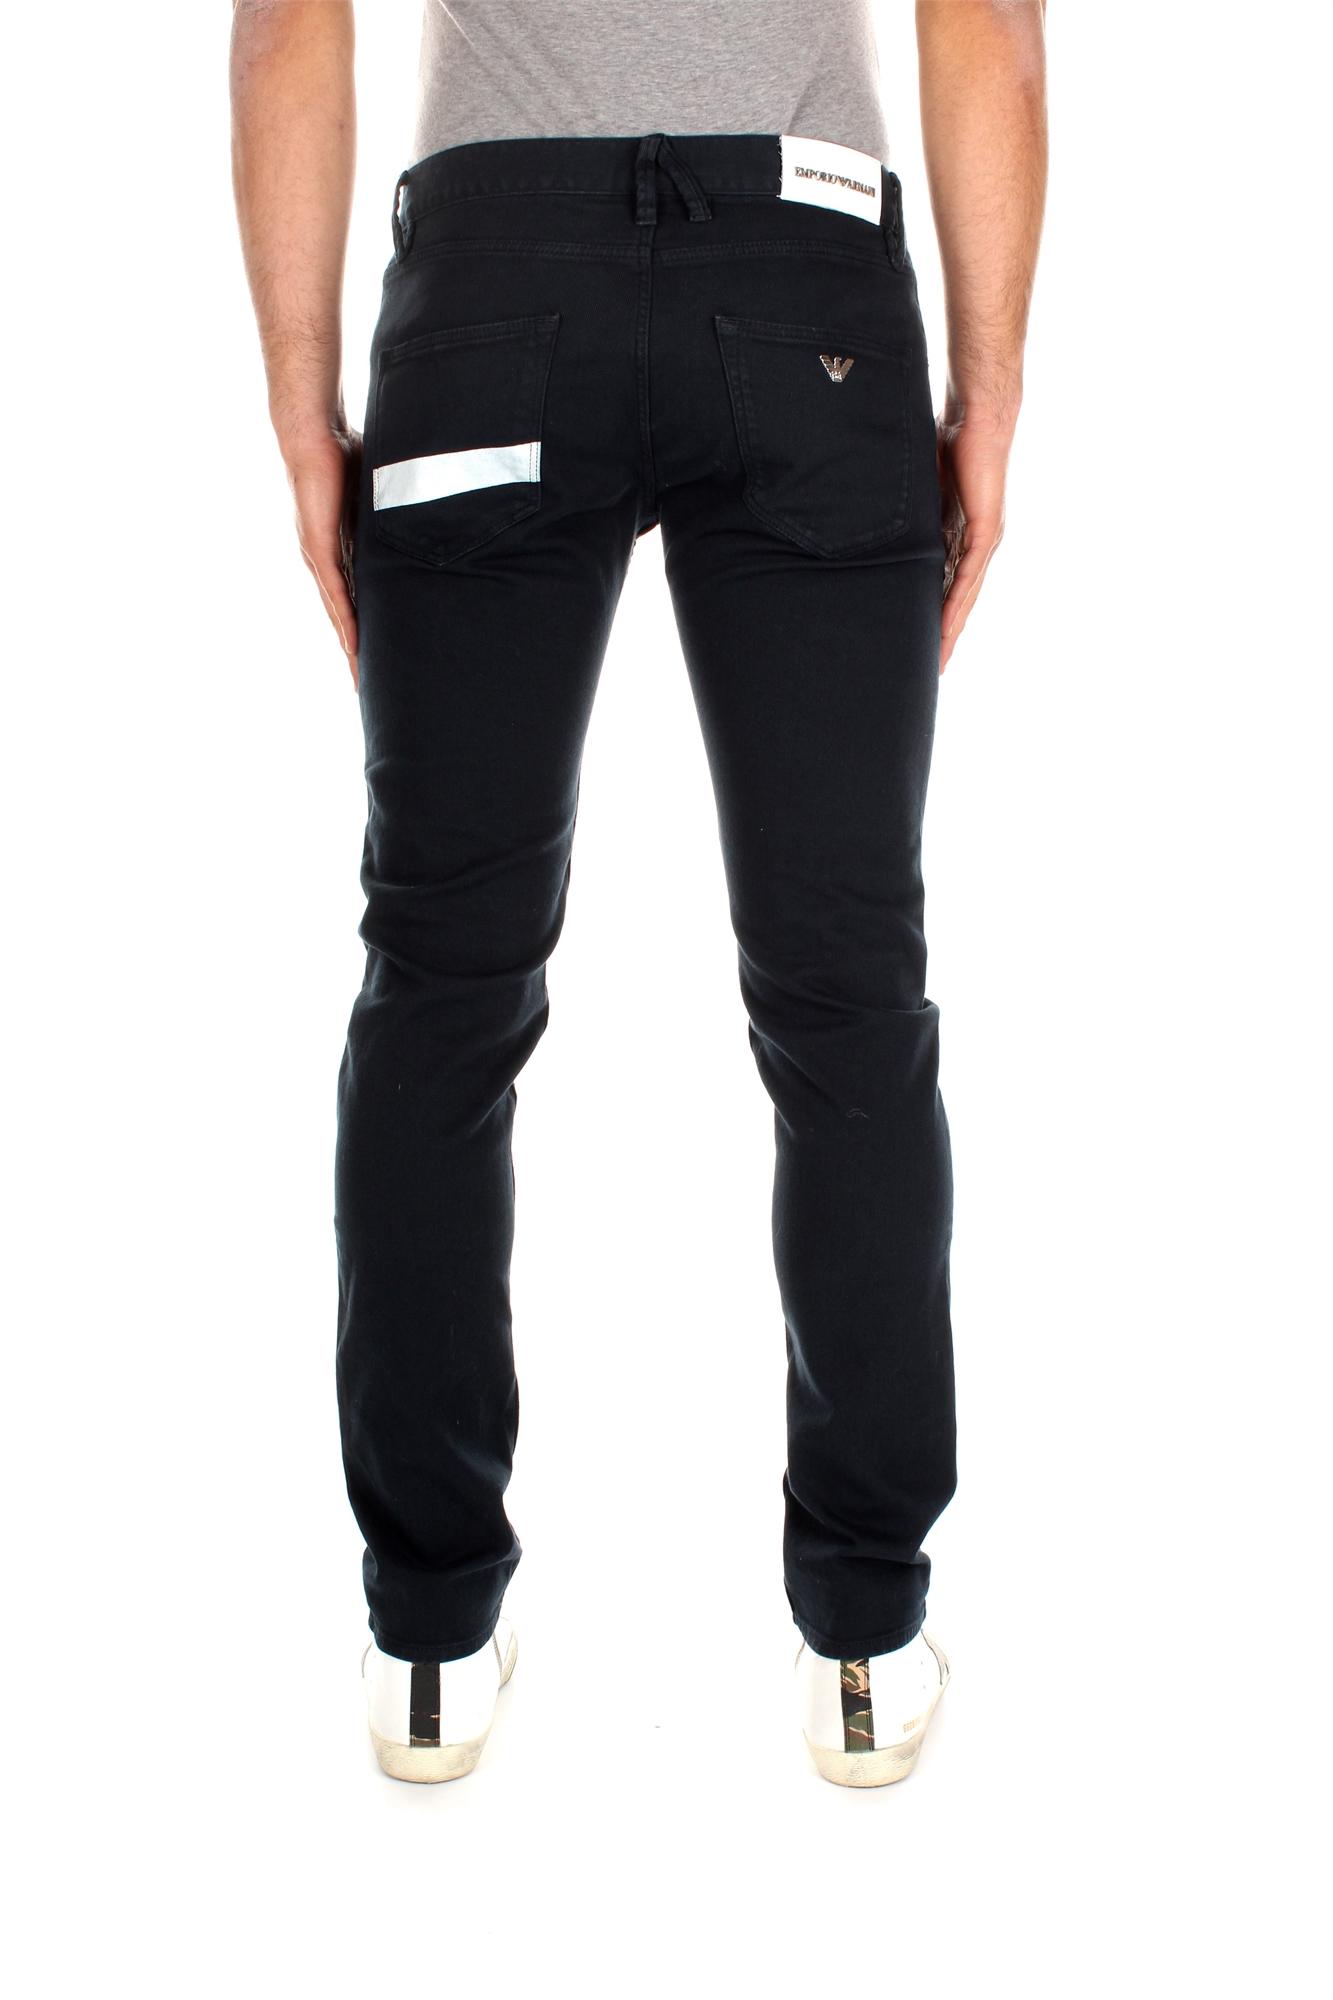 jeans armani emporio herren baumwolle blau cnj08lfc8 ebay. Black Bedroom Furniture Sets. Home Design Ideas